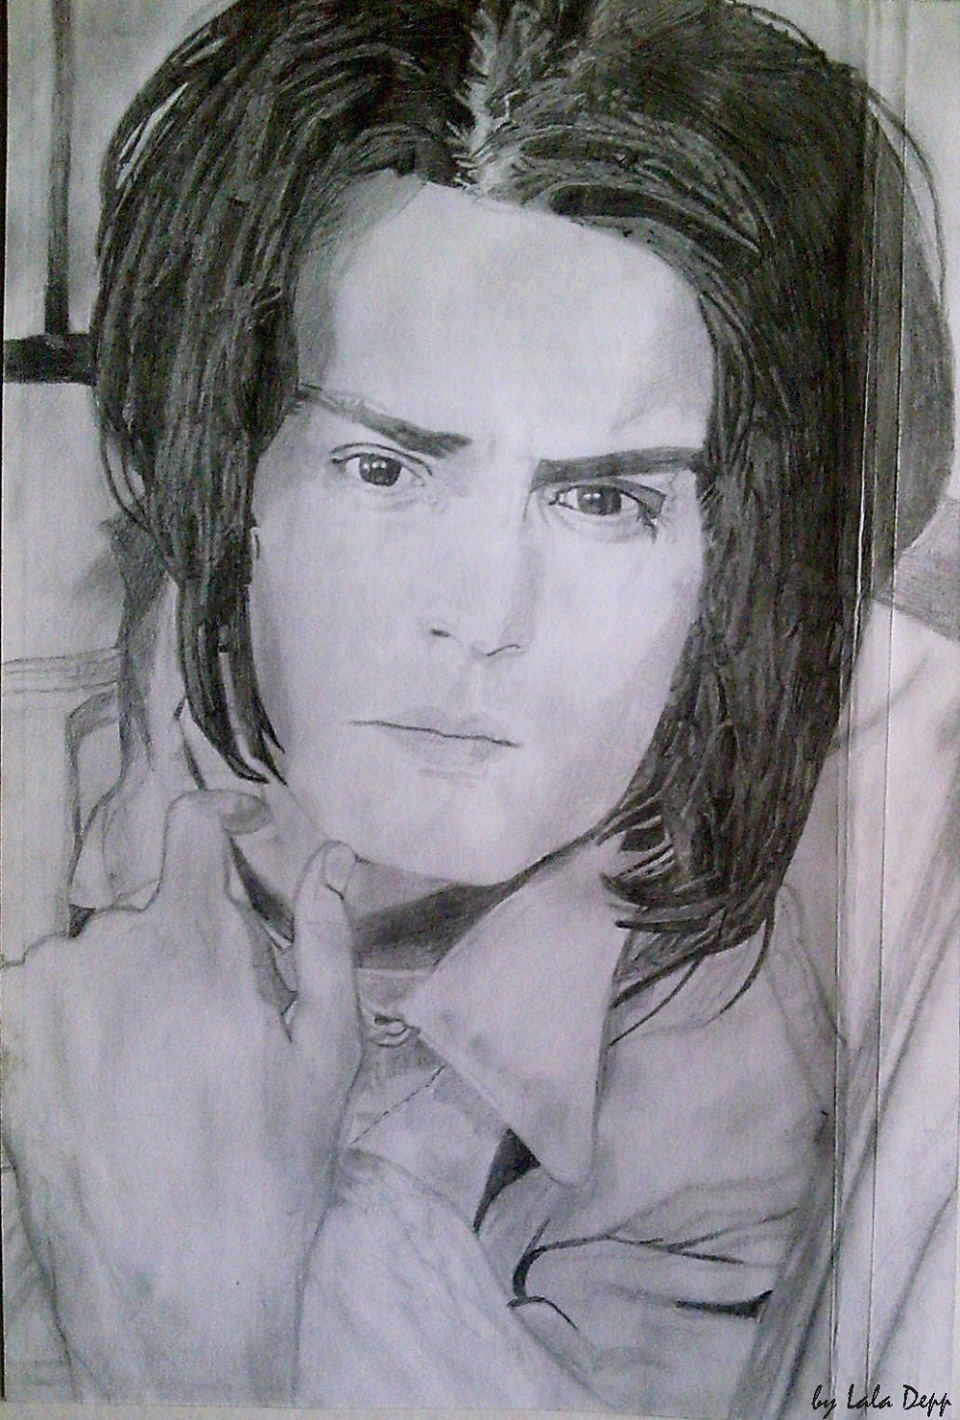 My Johnny Depp drawing:)